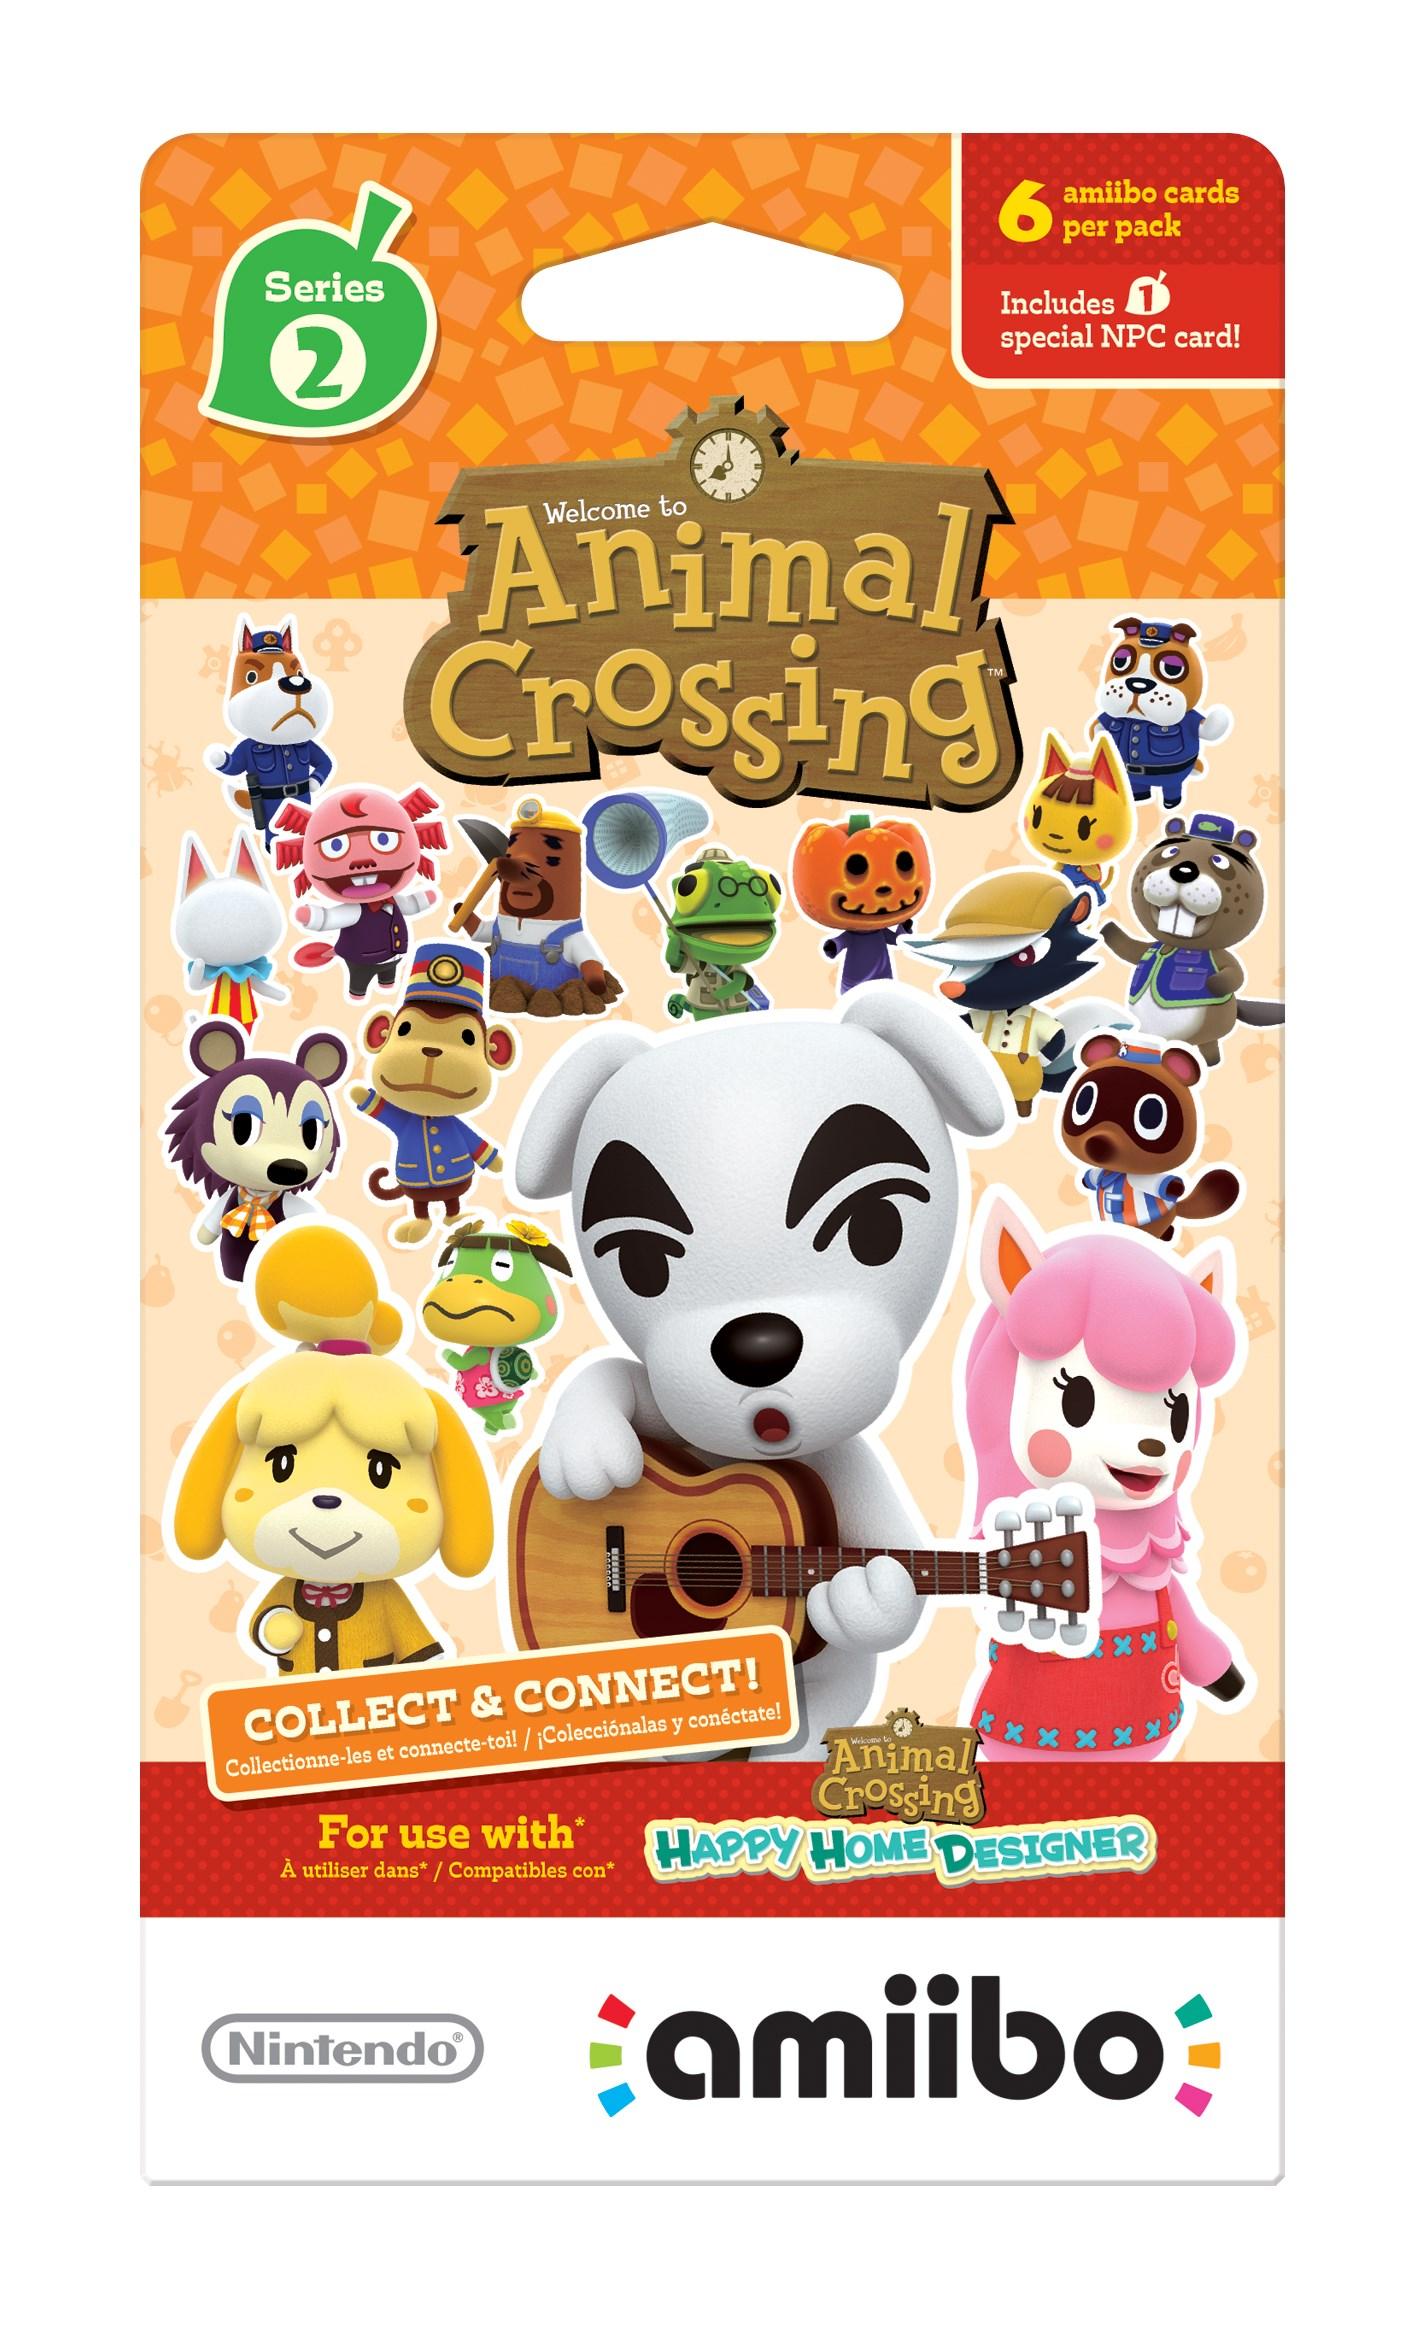 amiibo-cards_AnimalCrossing_Series2_pkg_png_jpgcopy.jpg